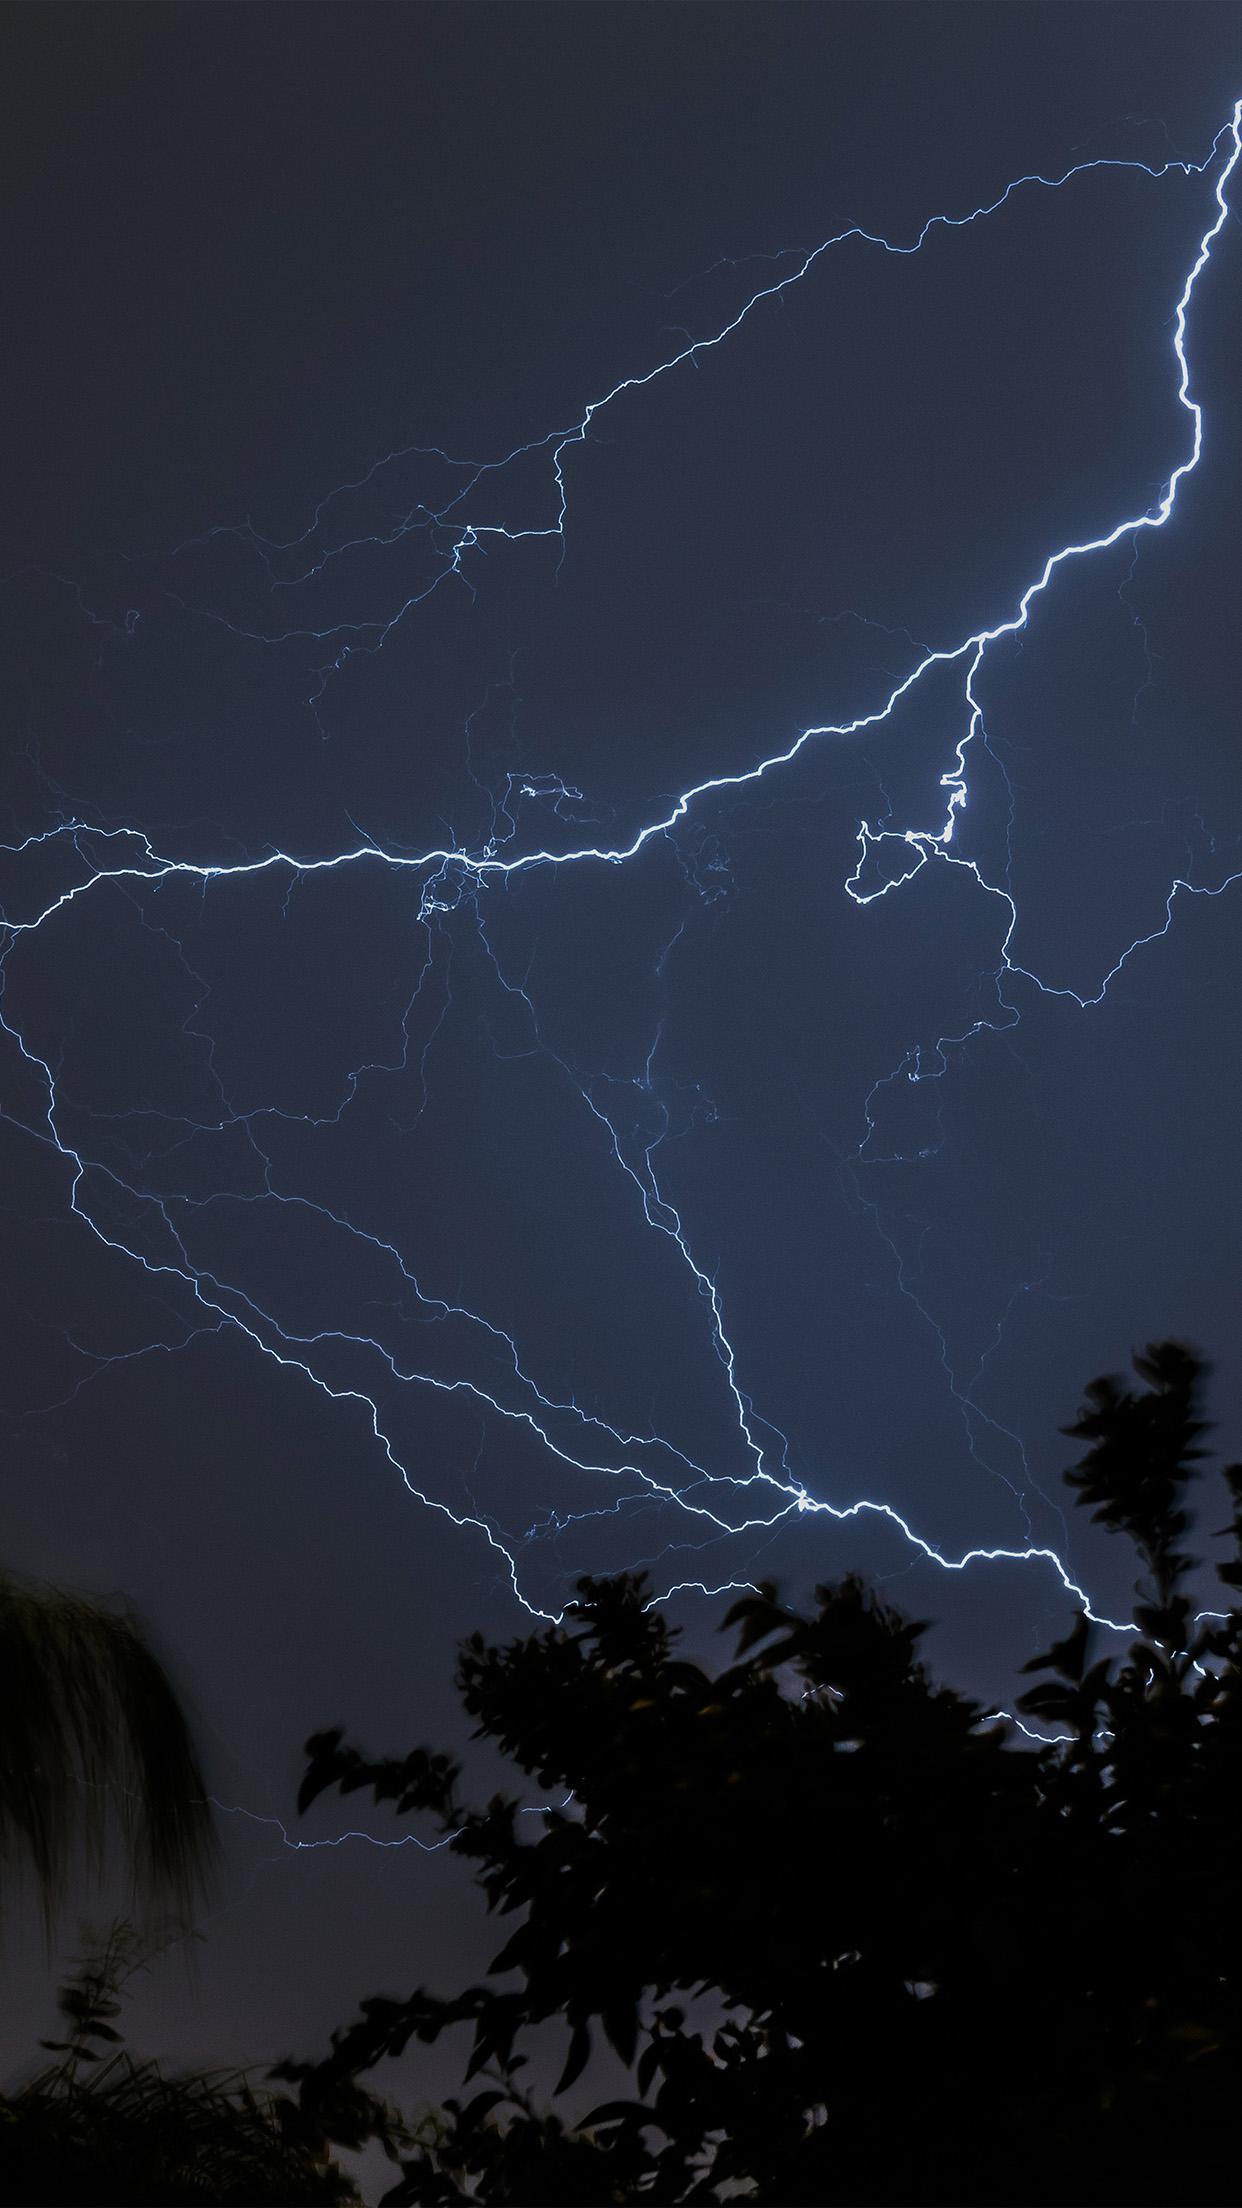 Iphone7papers Com Iphone7 Wallpaper Nj83 Thunder Bolt Sky Night Dark